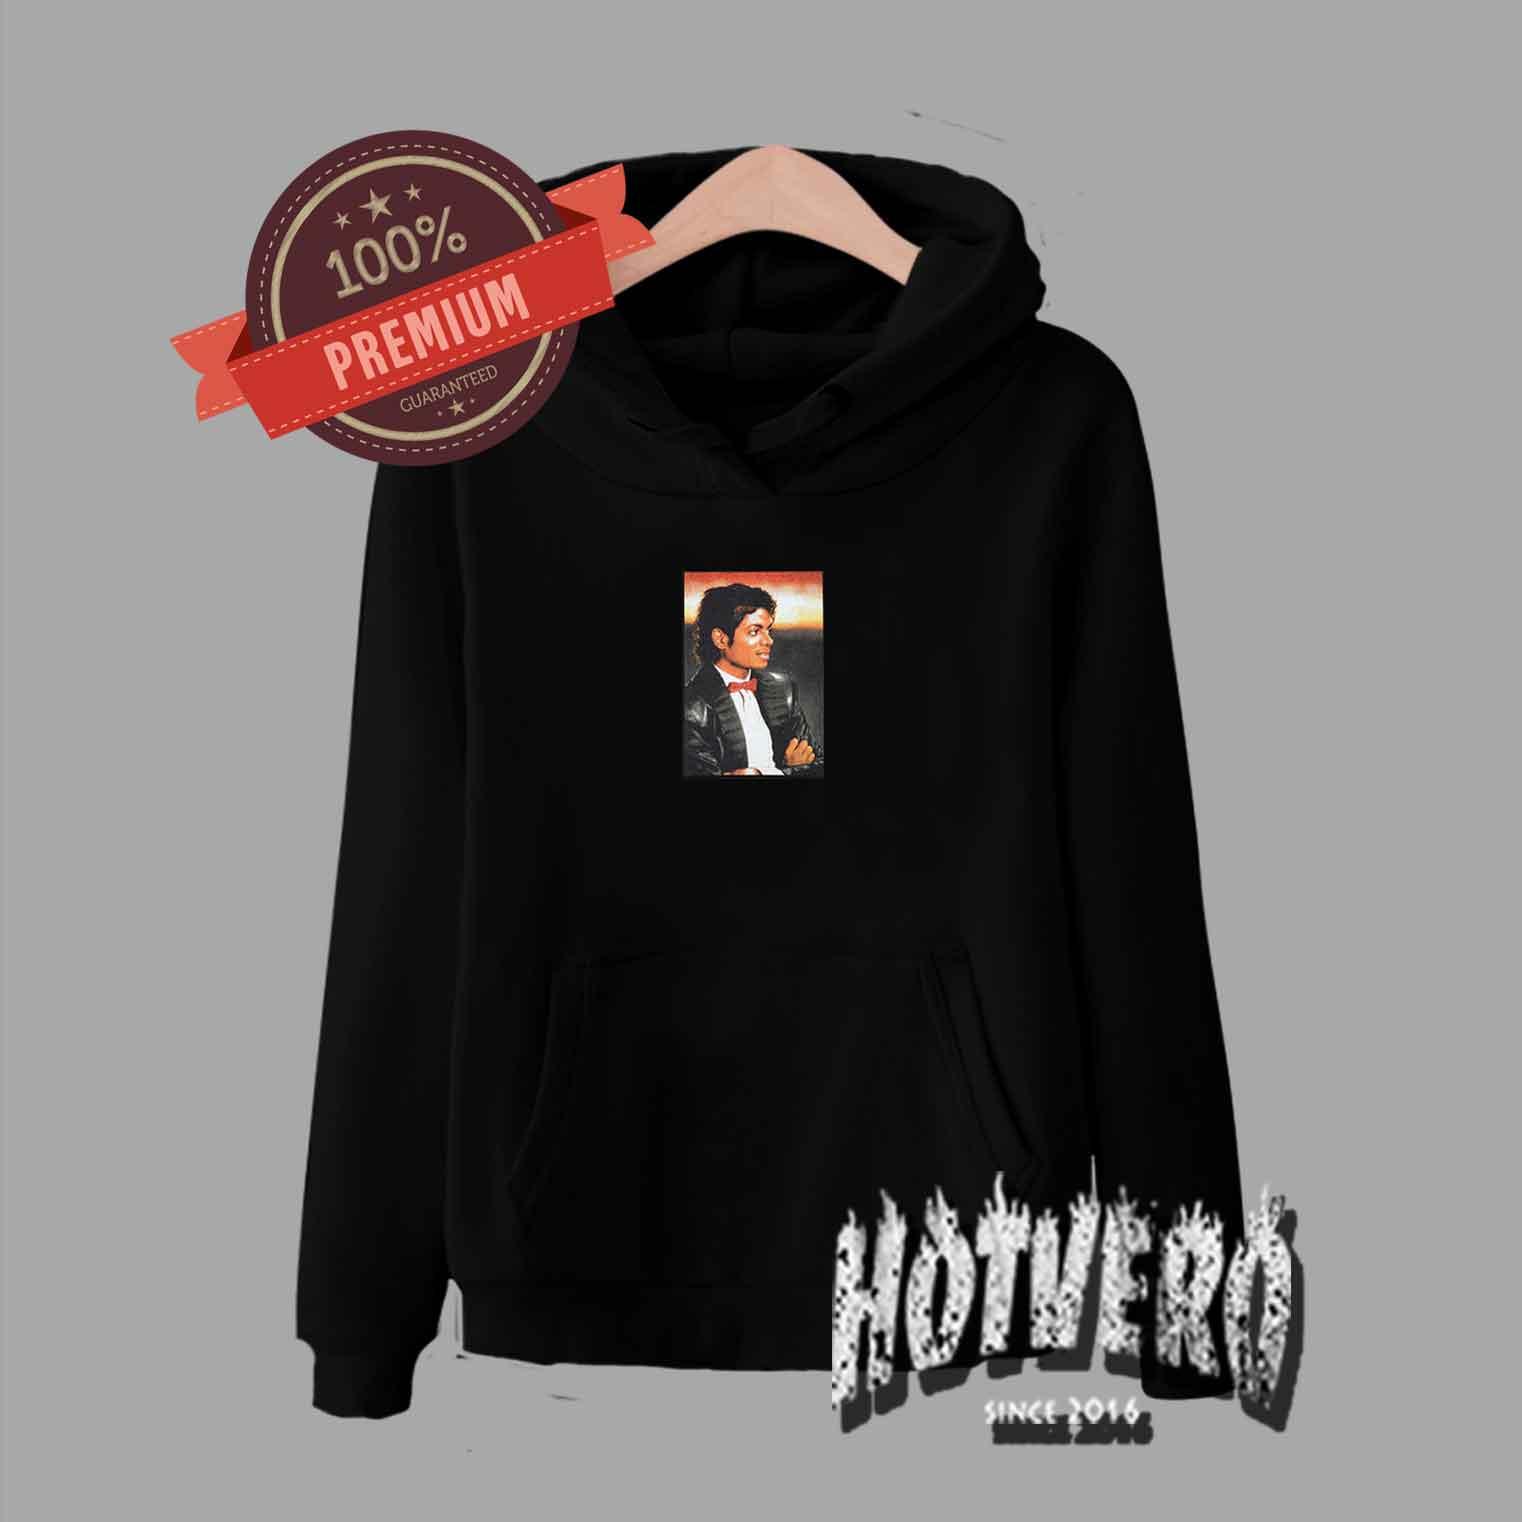 buy online caad7 96279 New Supreme MJ Michael Jackson Unisex Hoodie